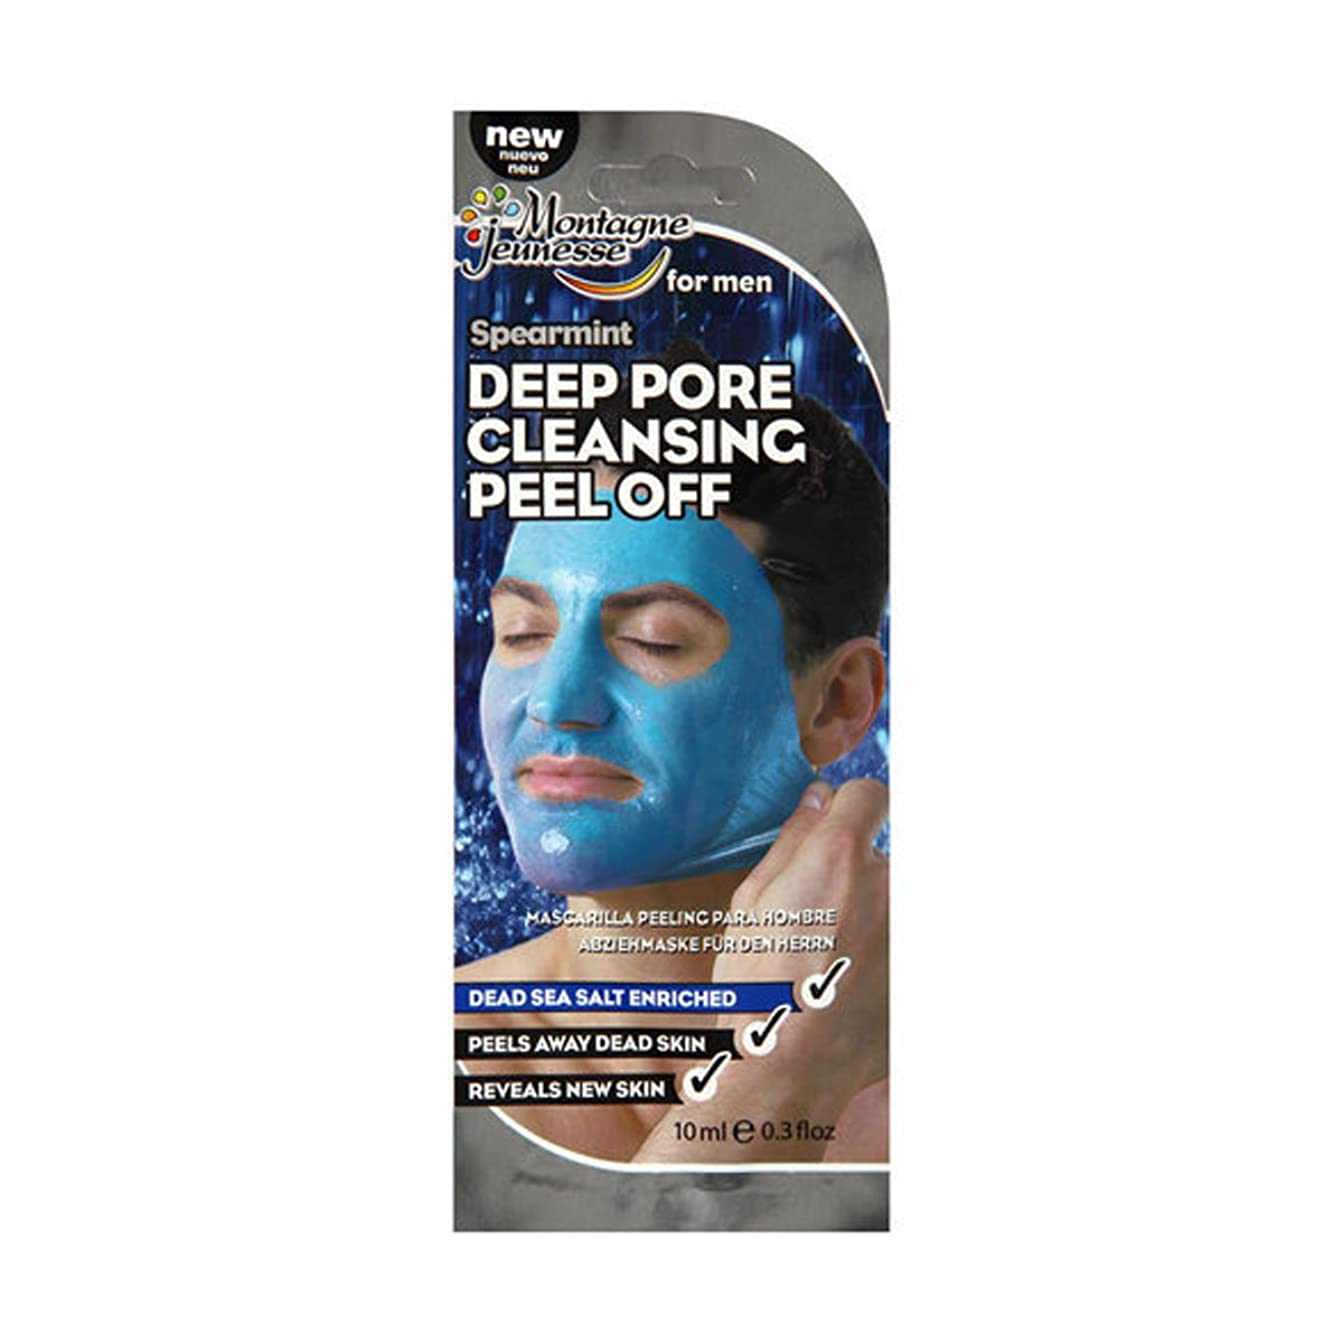 Montagne Jeunesse Men Deep Pore Cleansing Peel Off 10ml [並行輸入品]